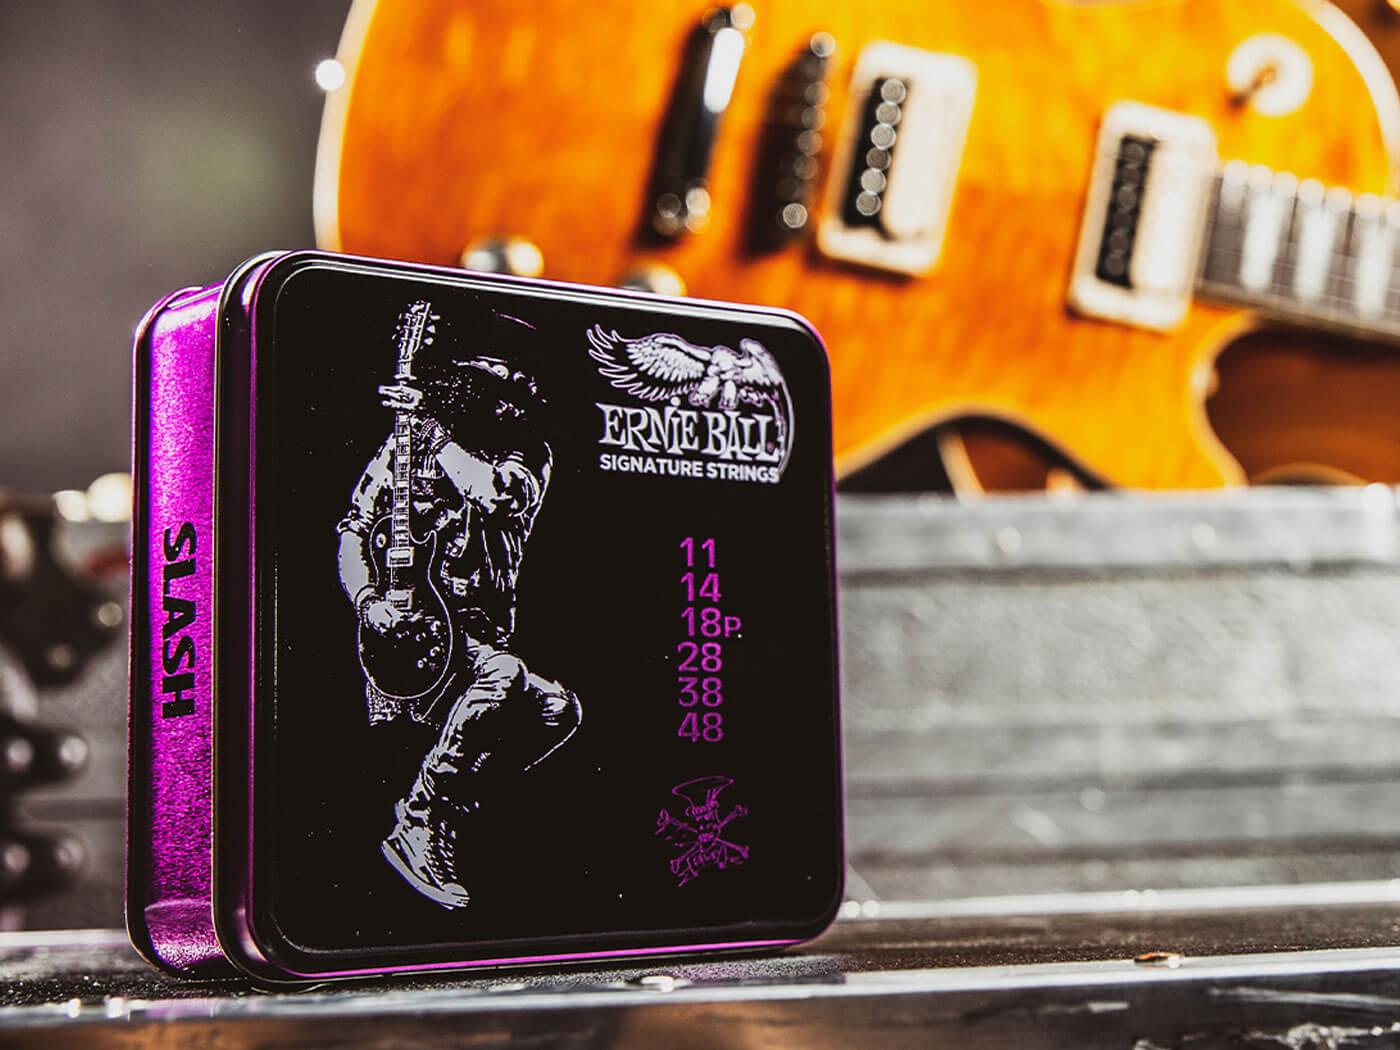 Ernie Ball Slash Strings case